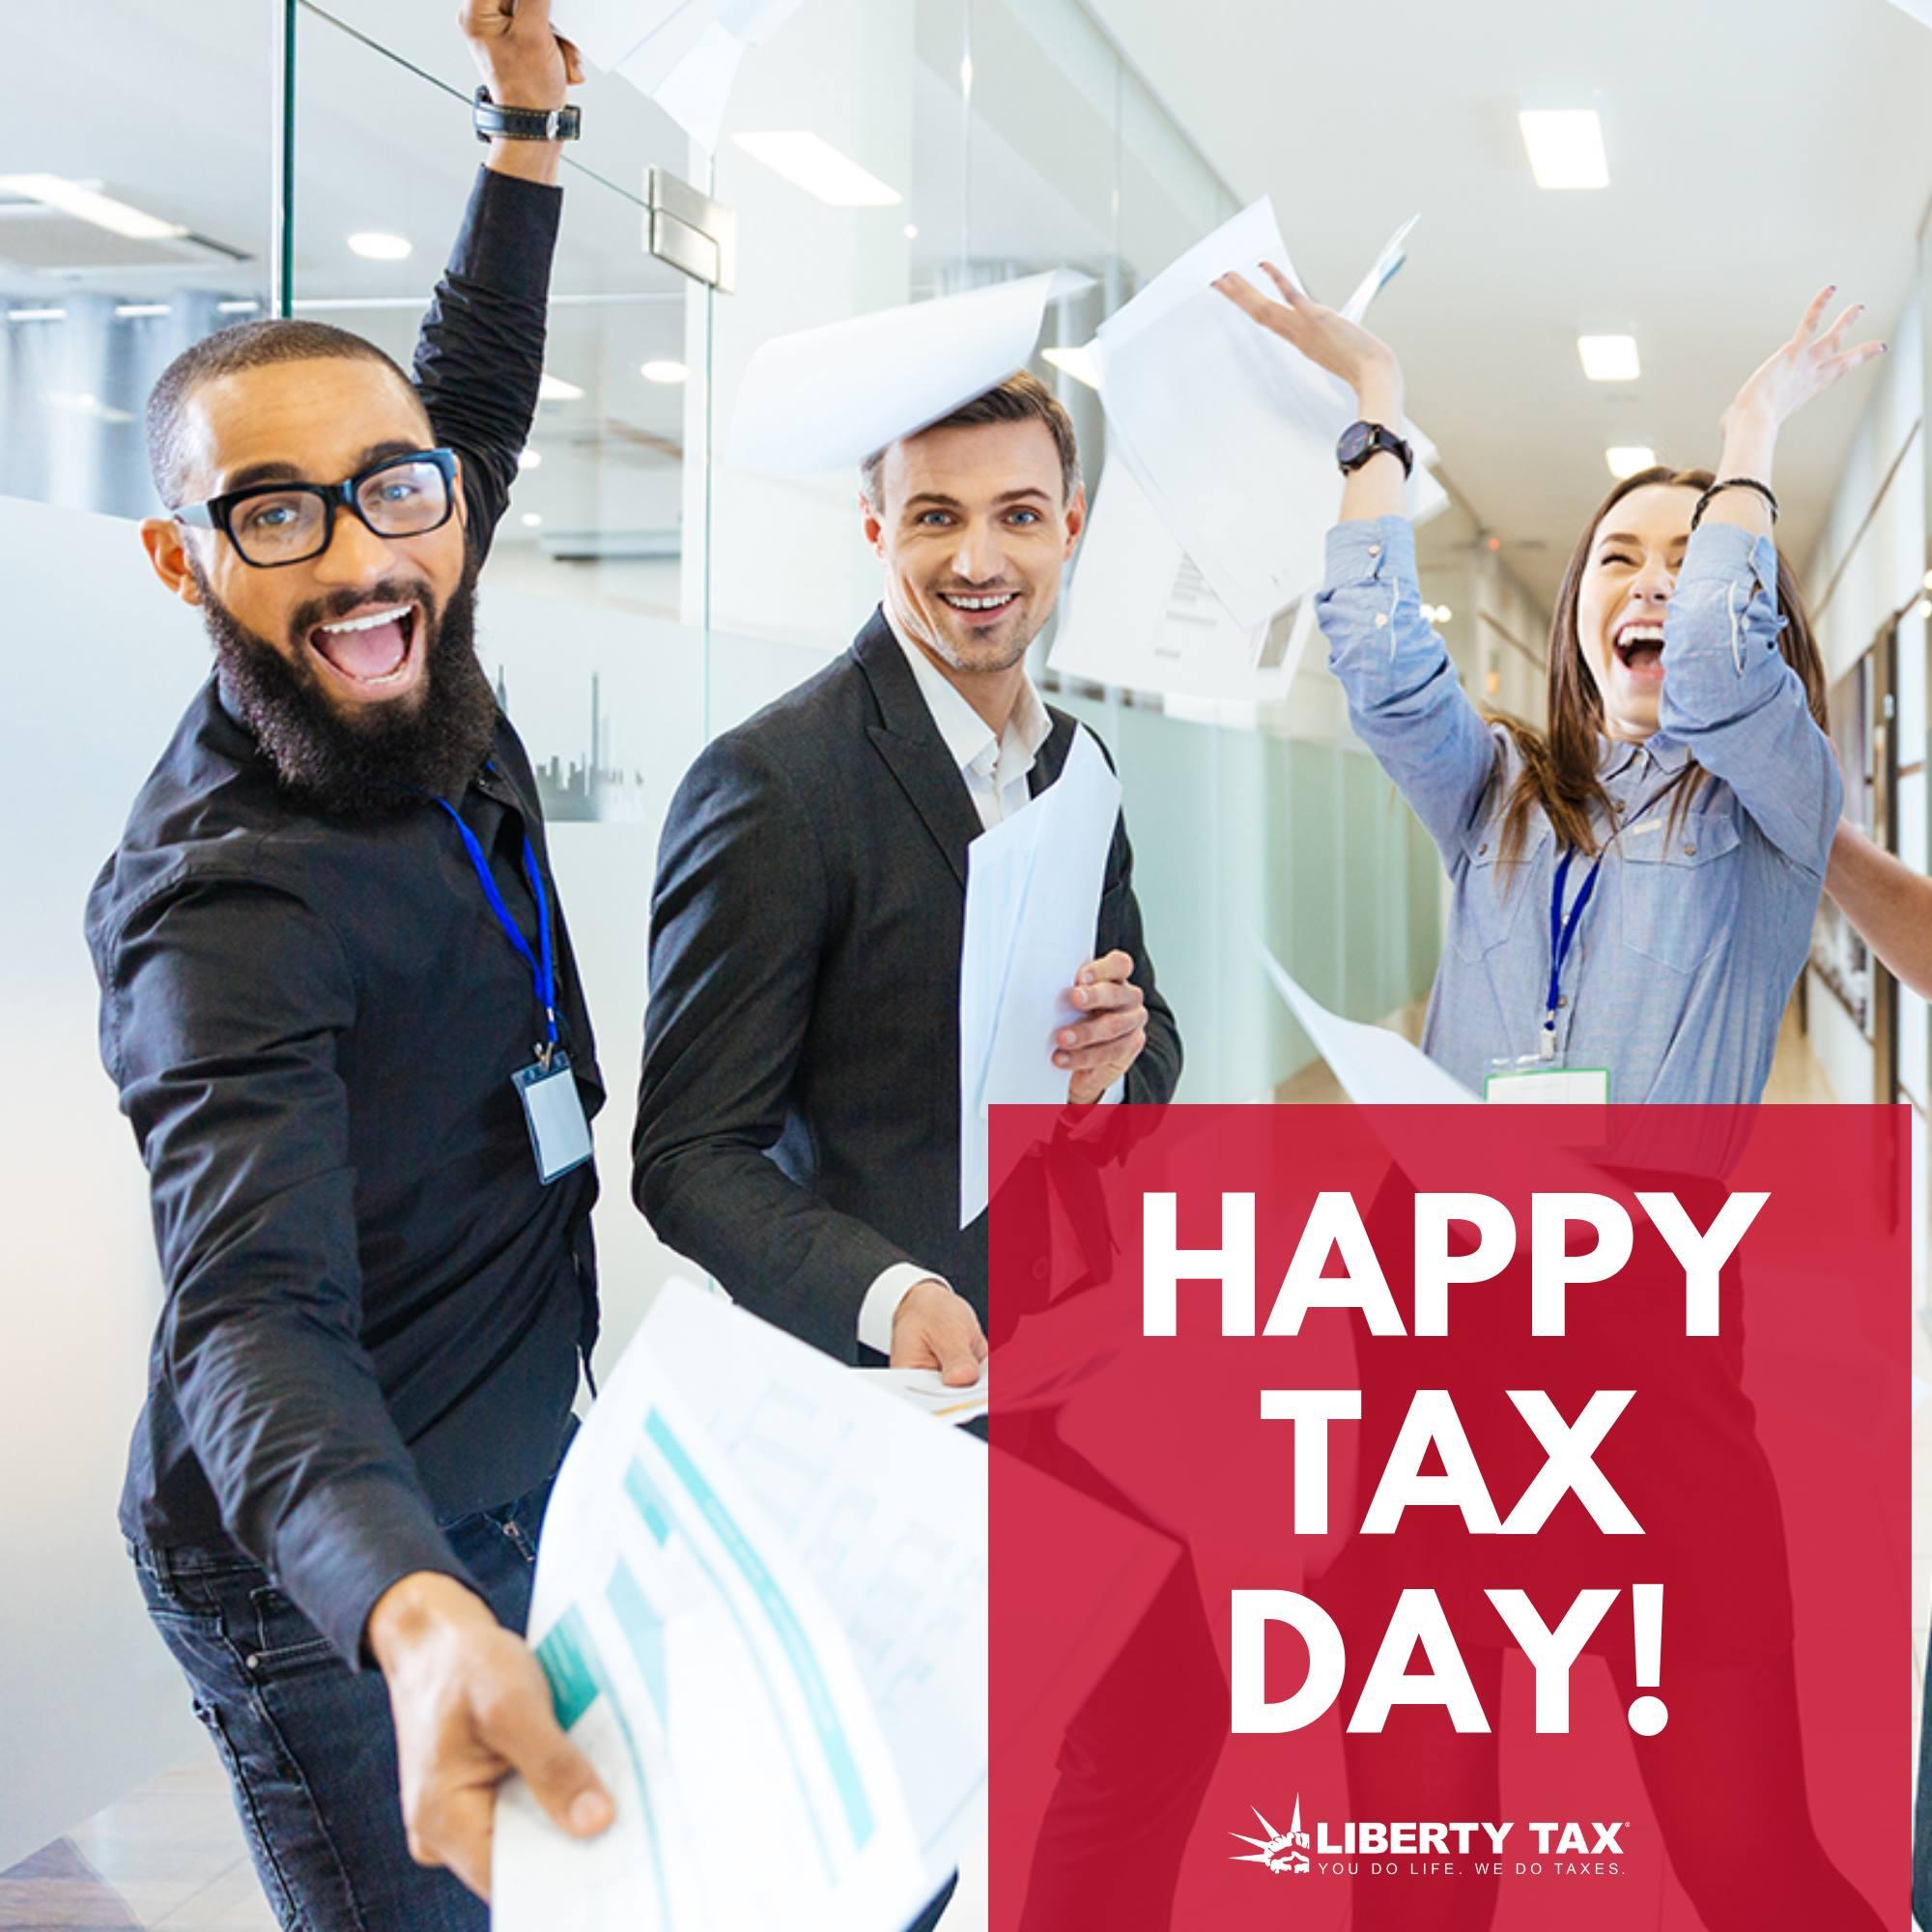 Liberty Tax Service 1735 W Sunshine St Suite 100, Springfield